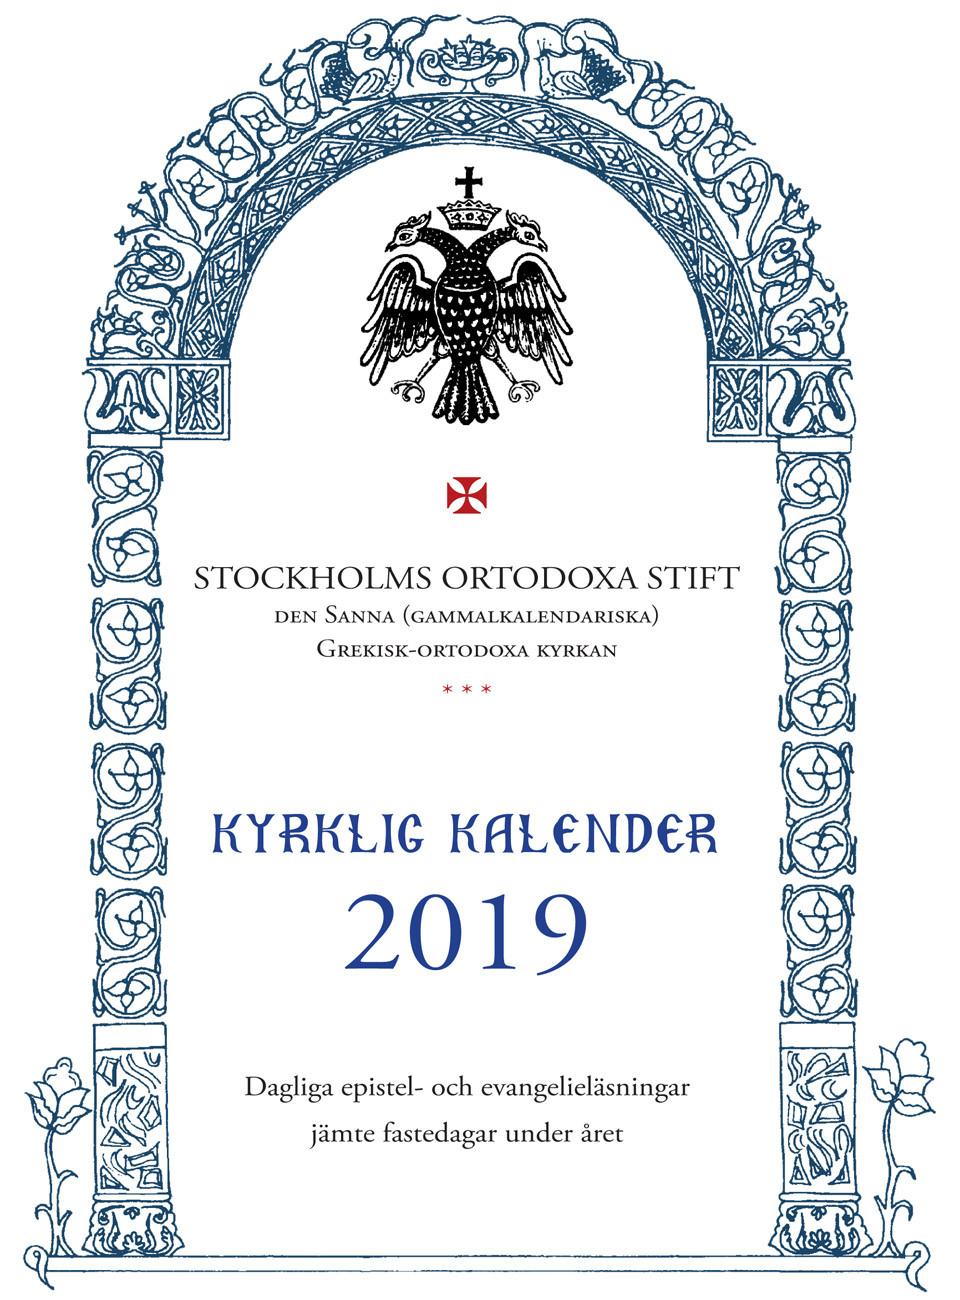 Kyrklig kalender 2019